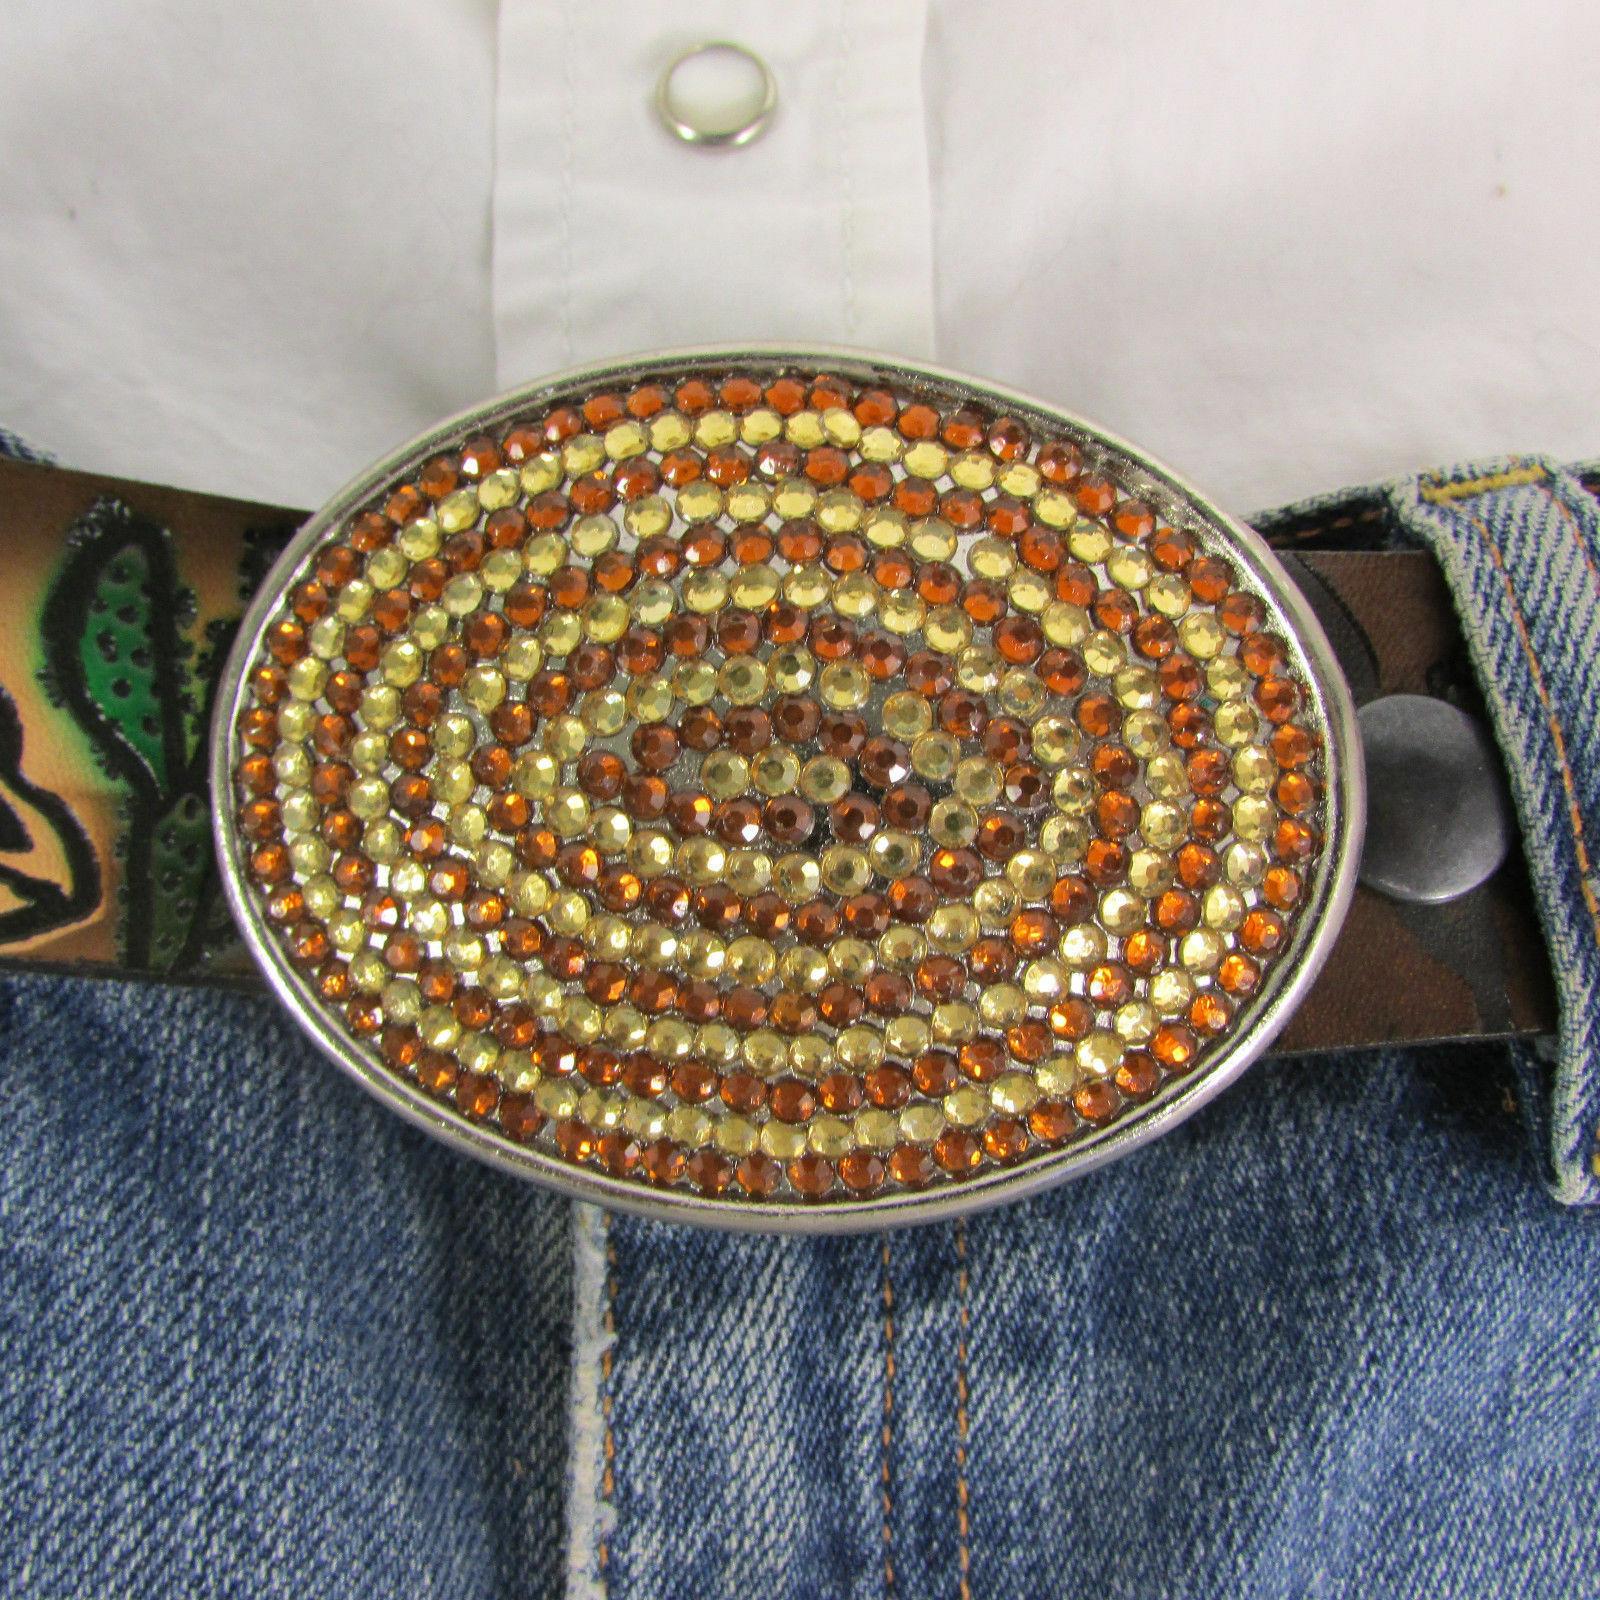 Mode Cowgirl Homme Femme Boucle Ovale Western Métal Argent Marron Strass image 3